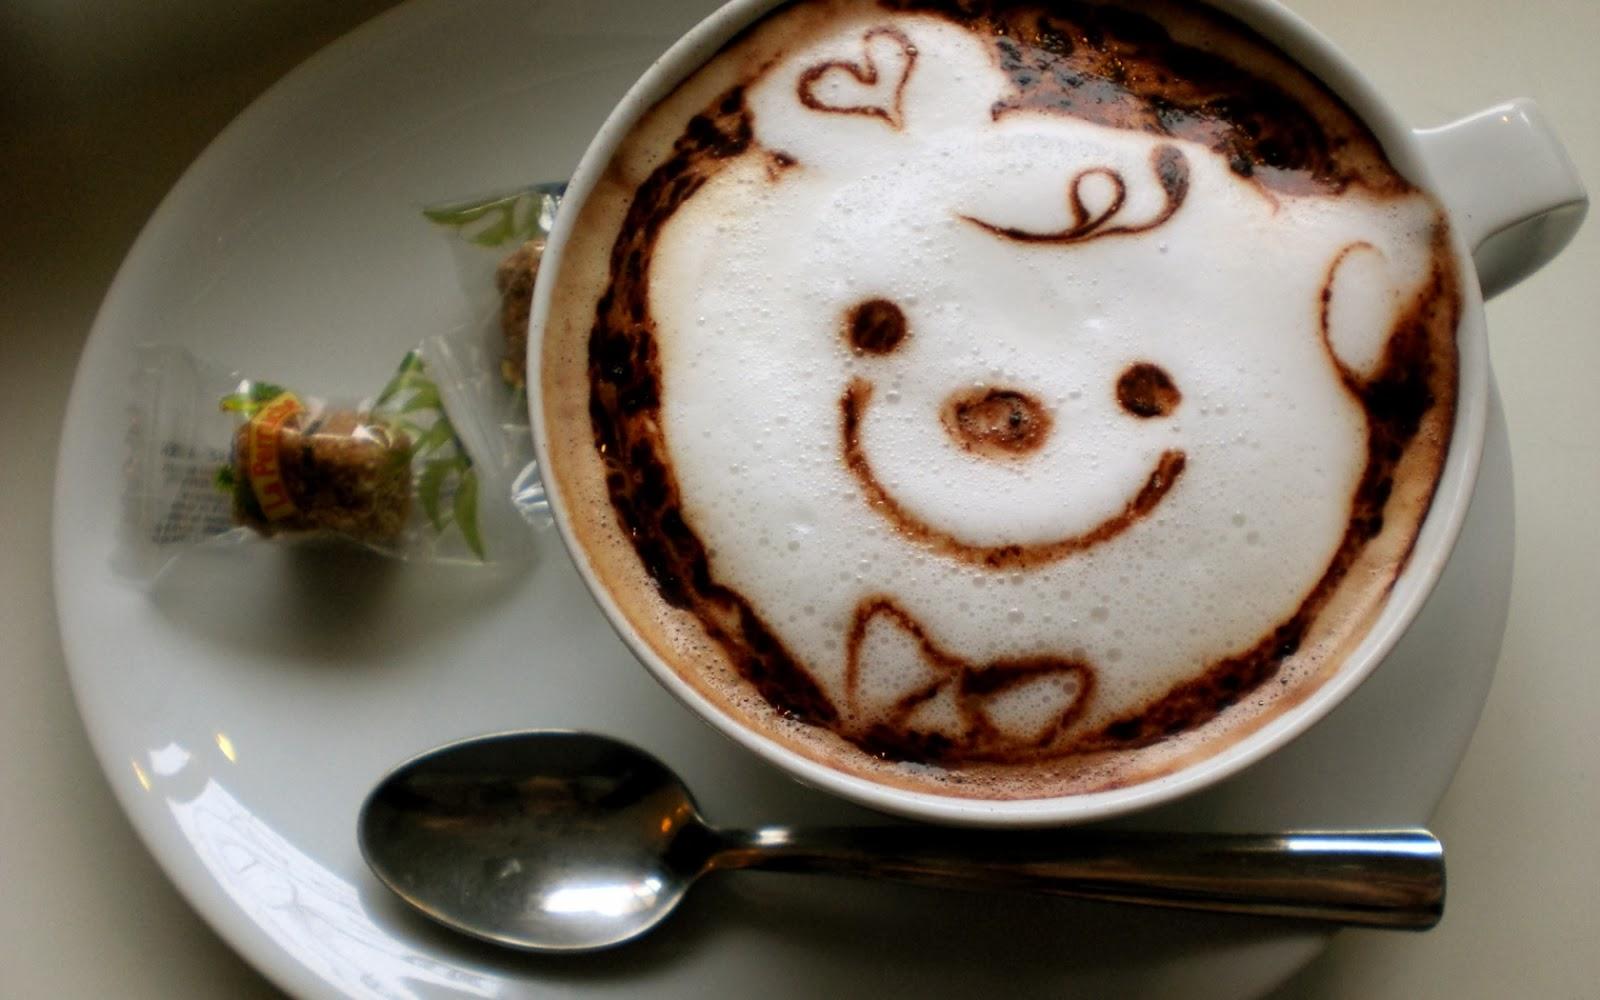 Cara divertida café